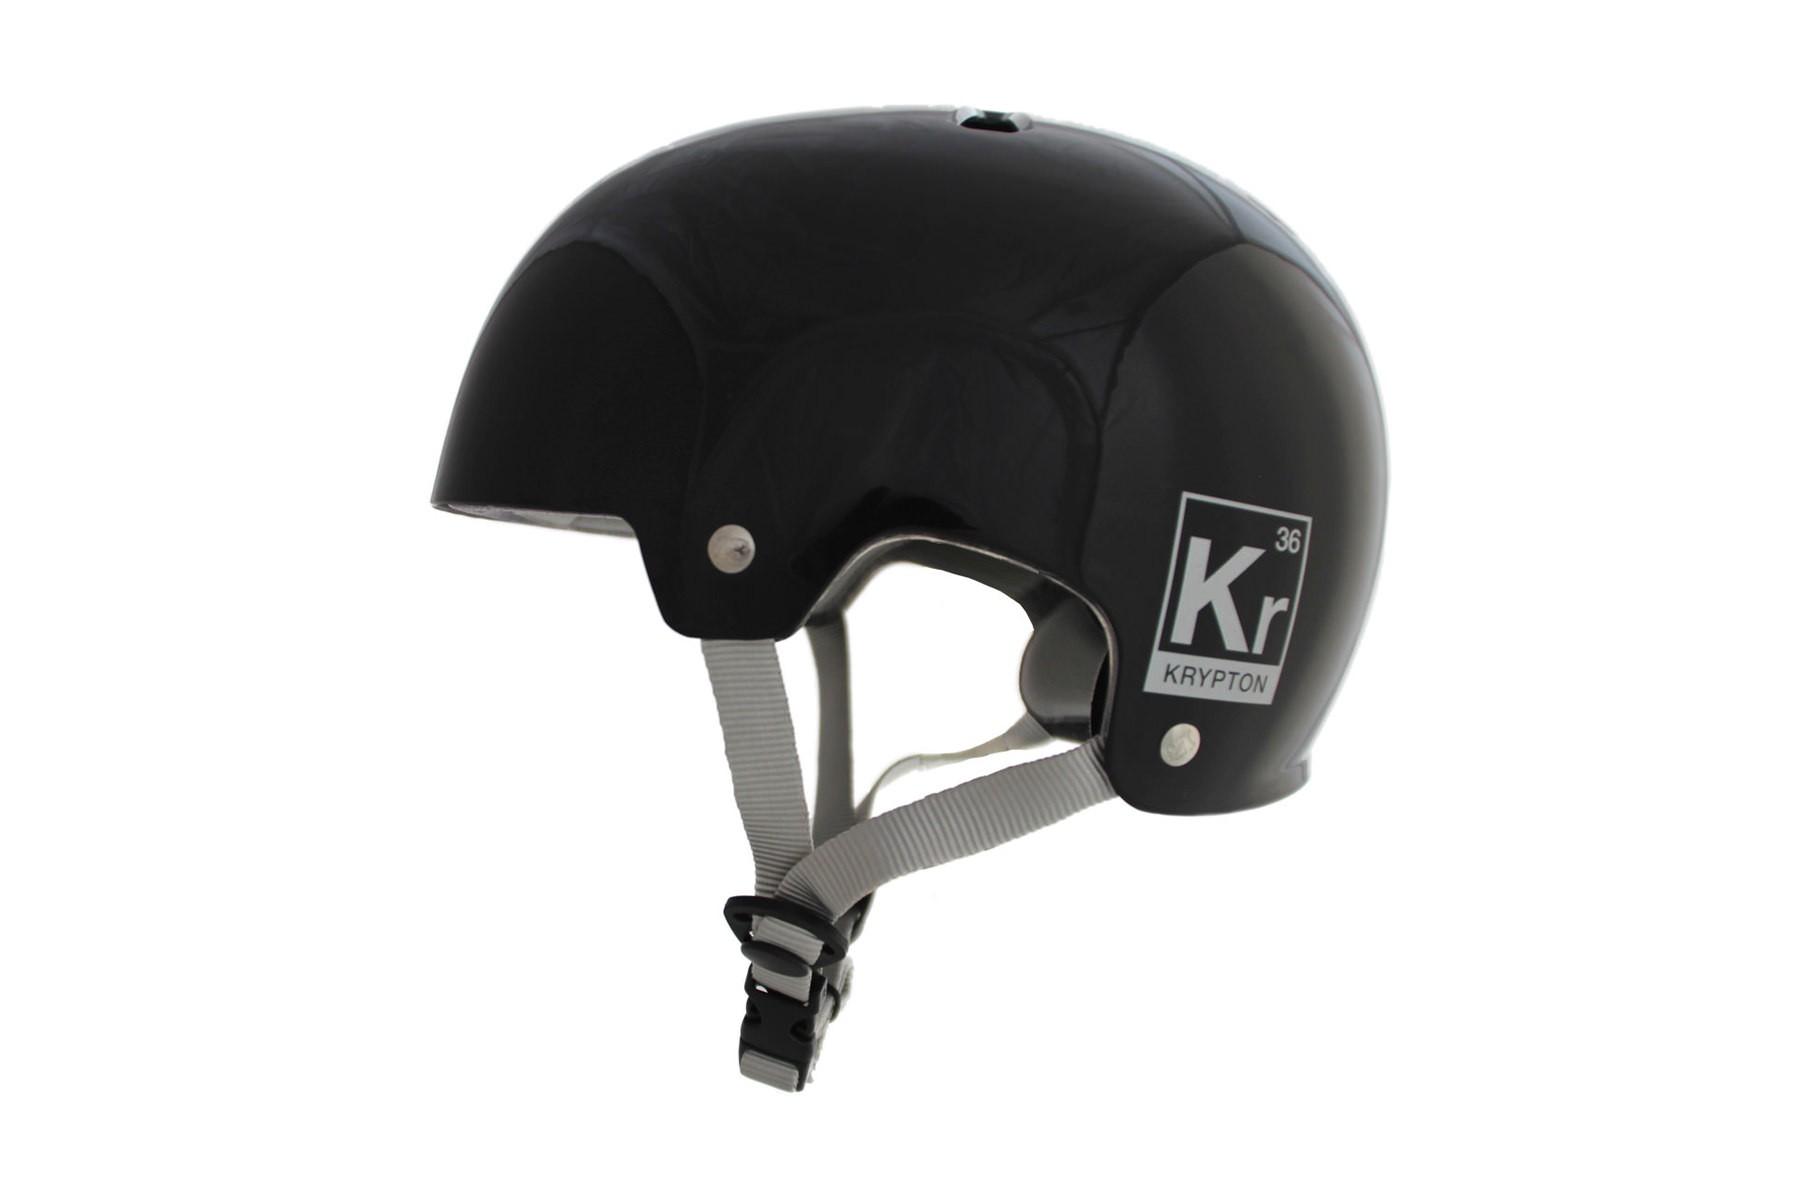 ALK13 Helmet Krypton Black Glossy